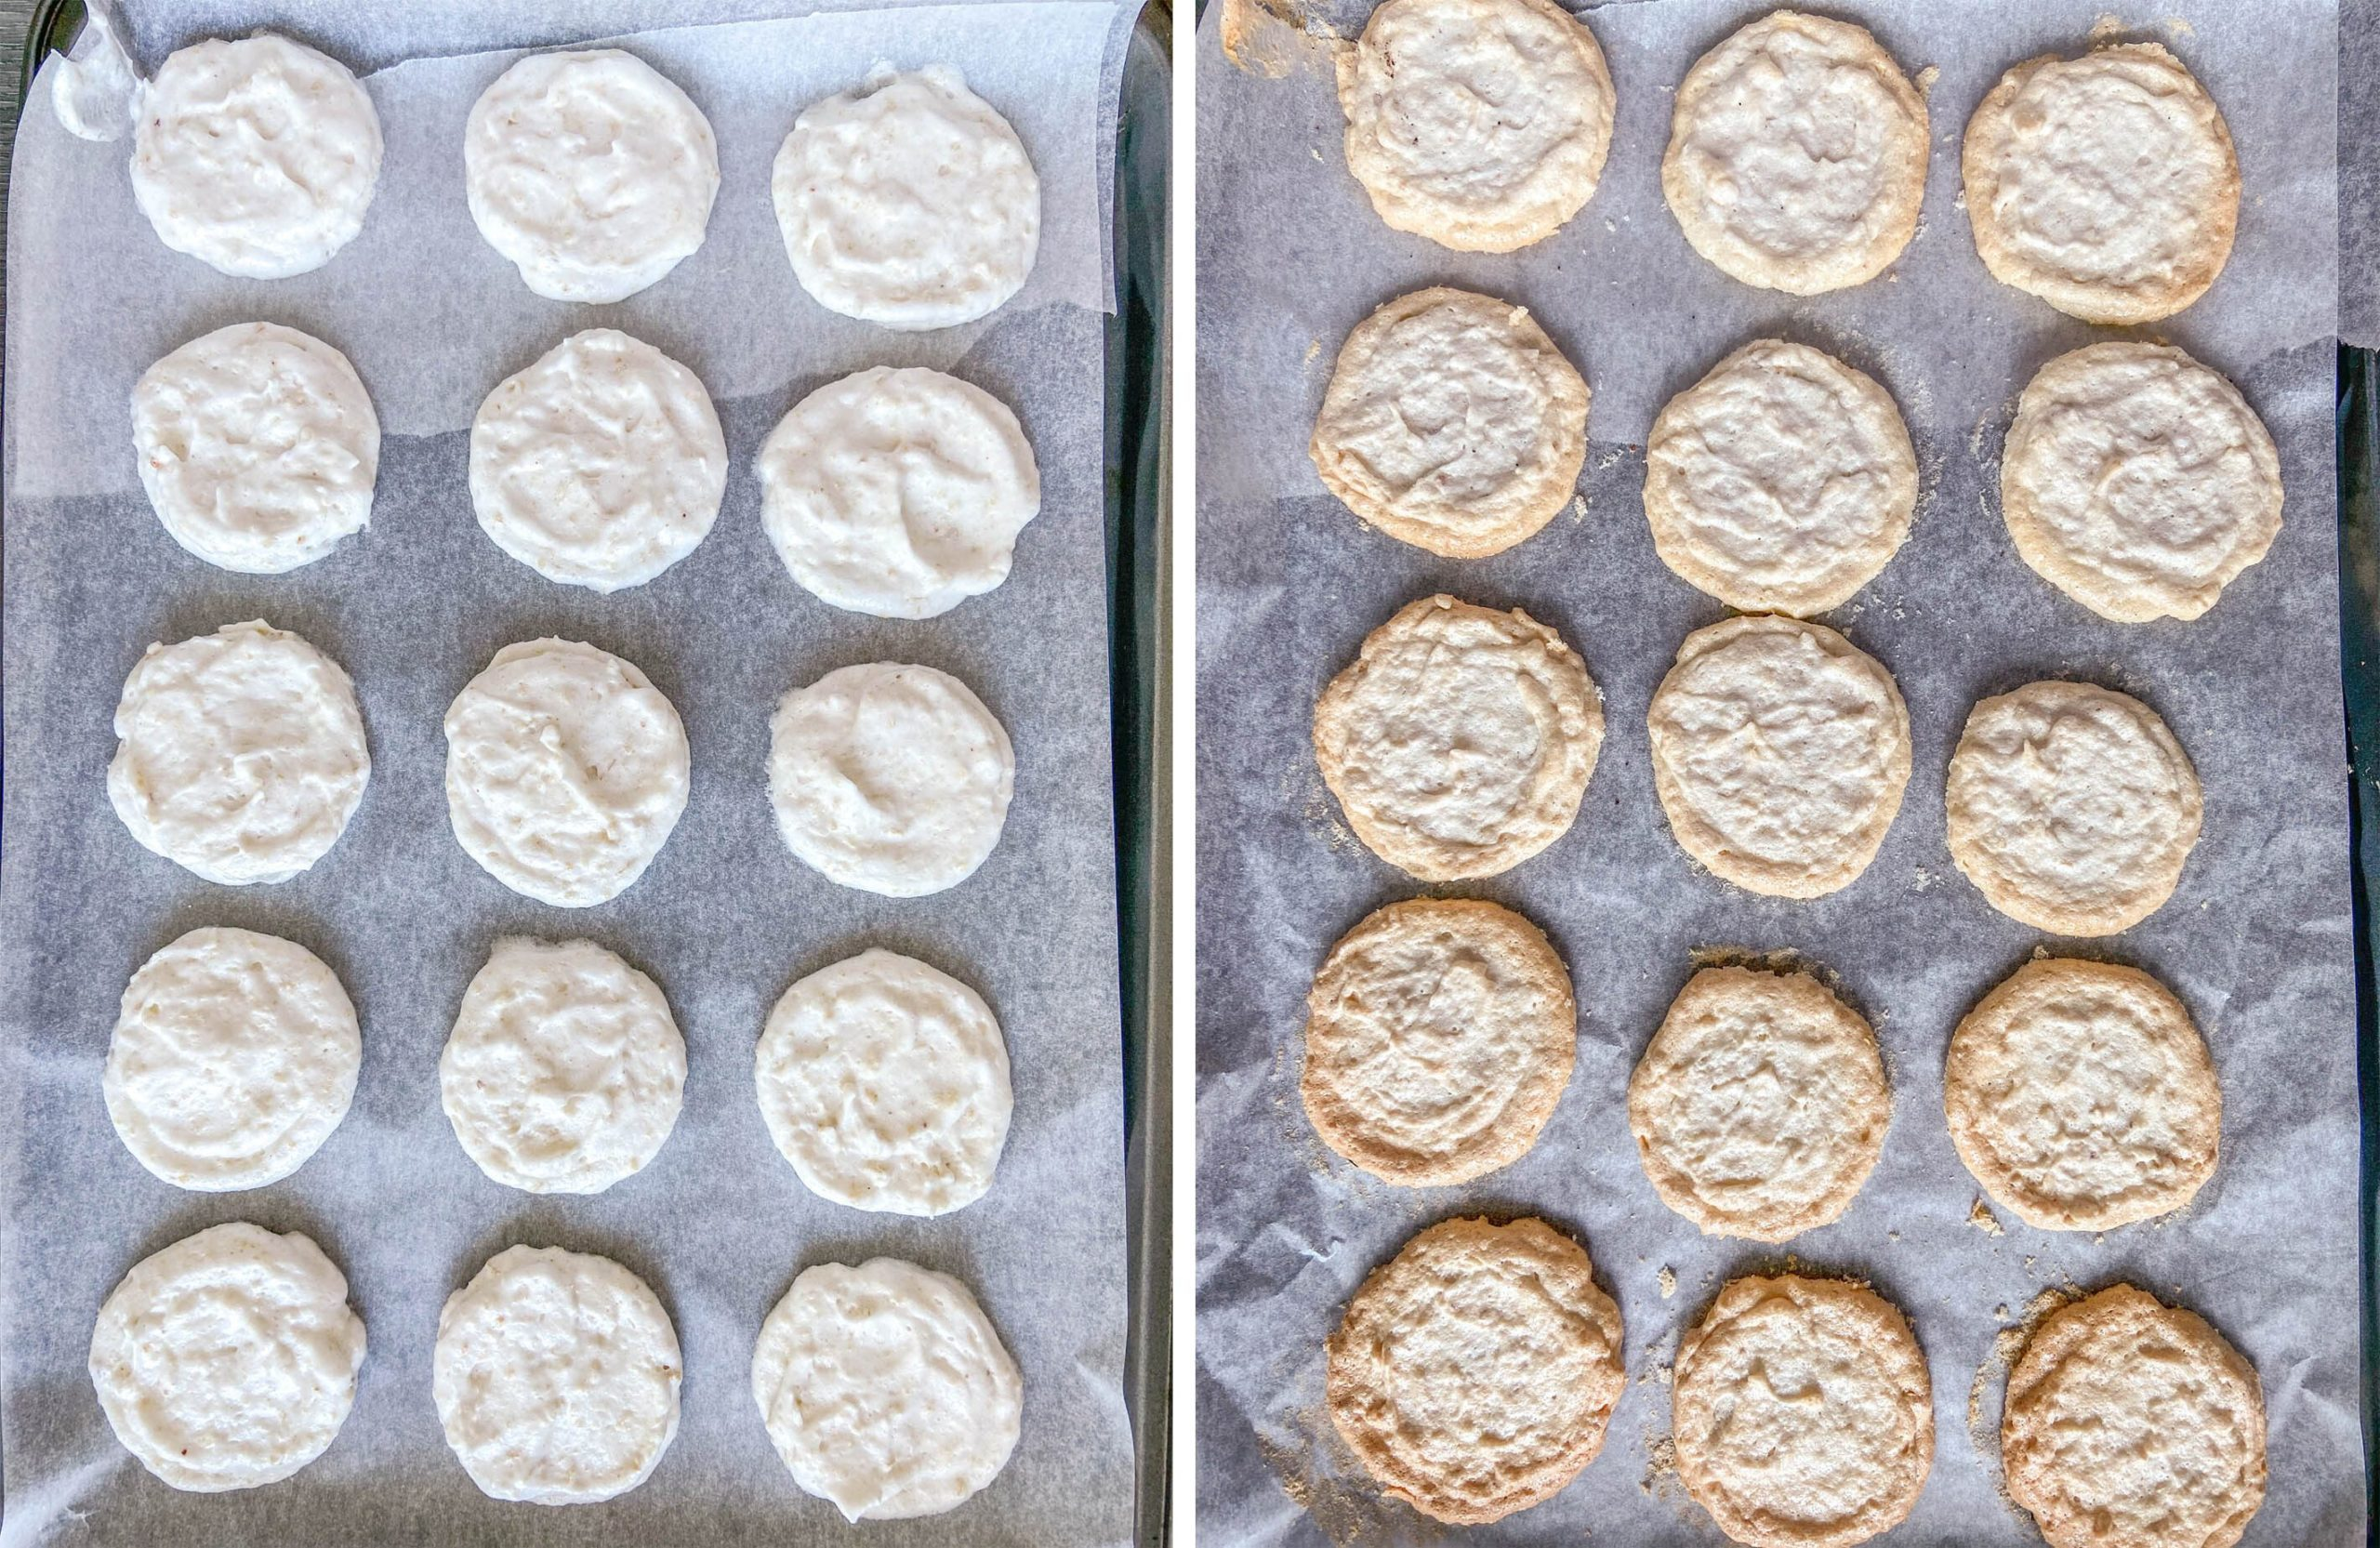 Silvanas cashew meringue step 5